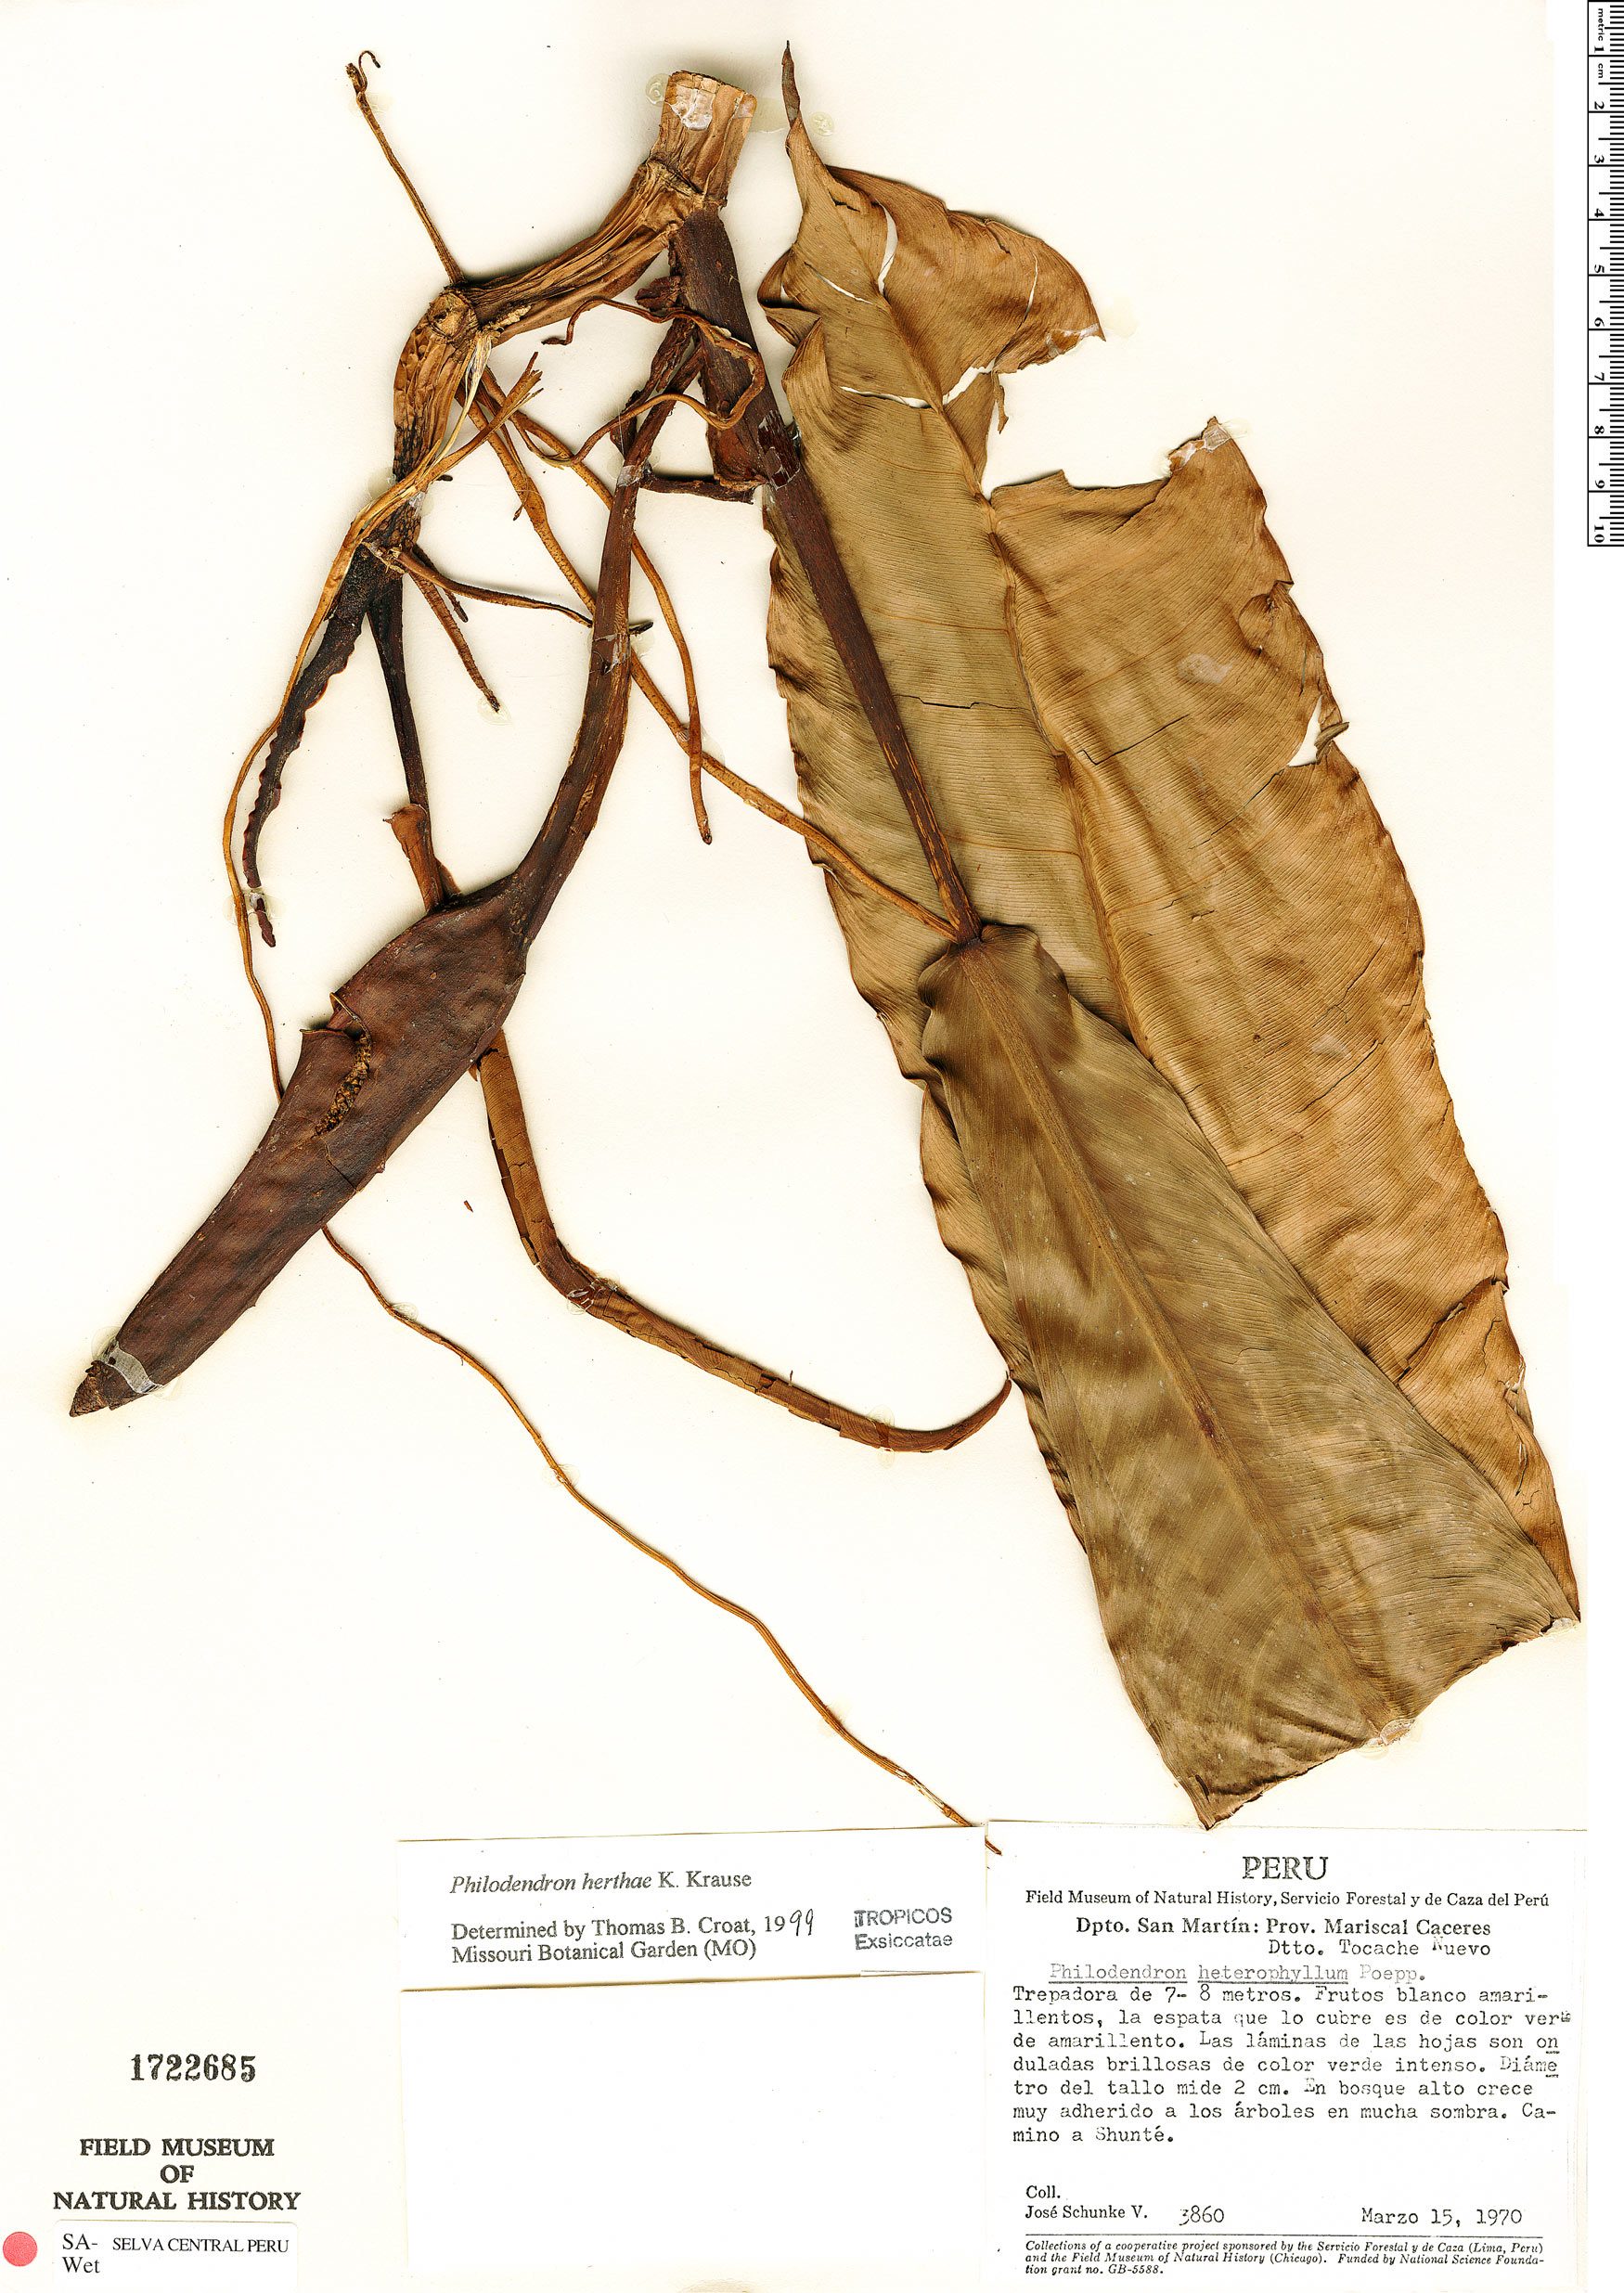 Specimen: Philodendron herthae